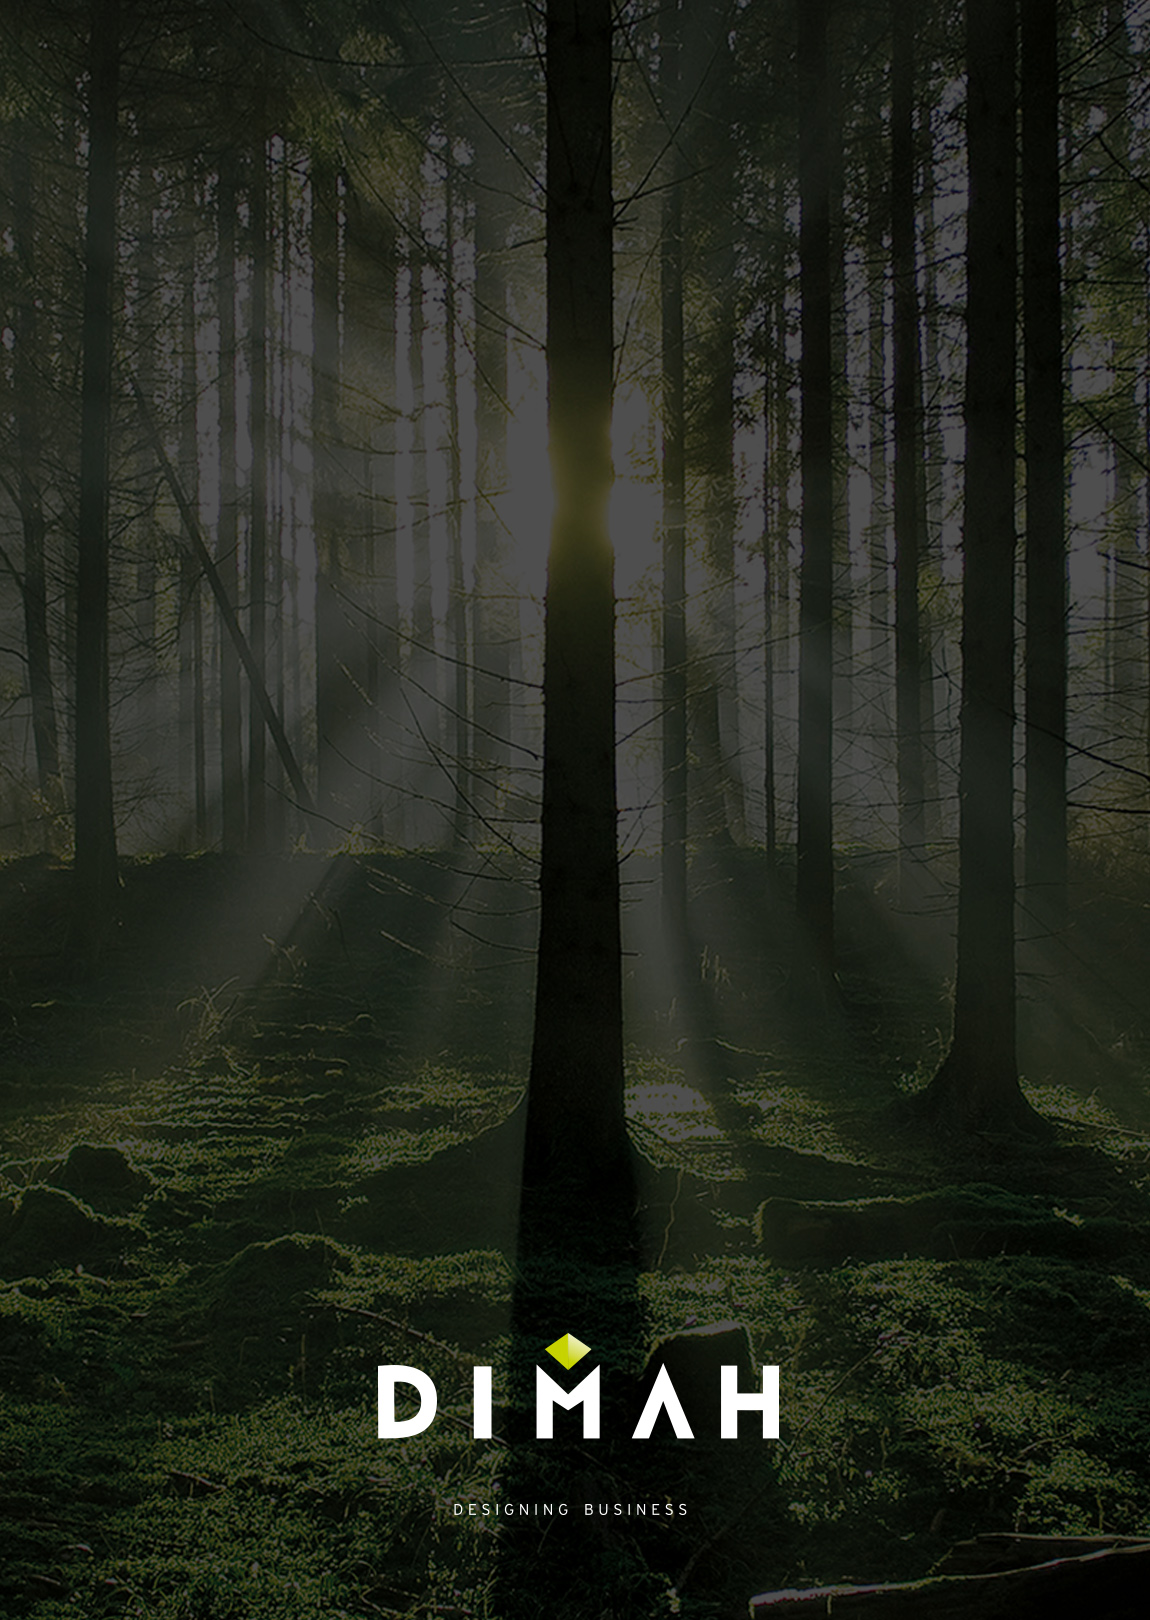 Dimah Corporate Design